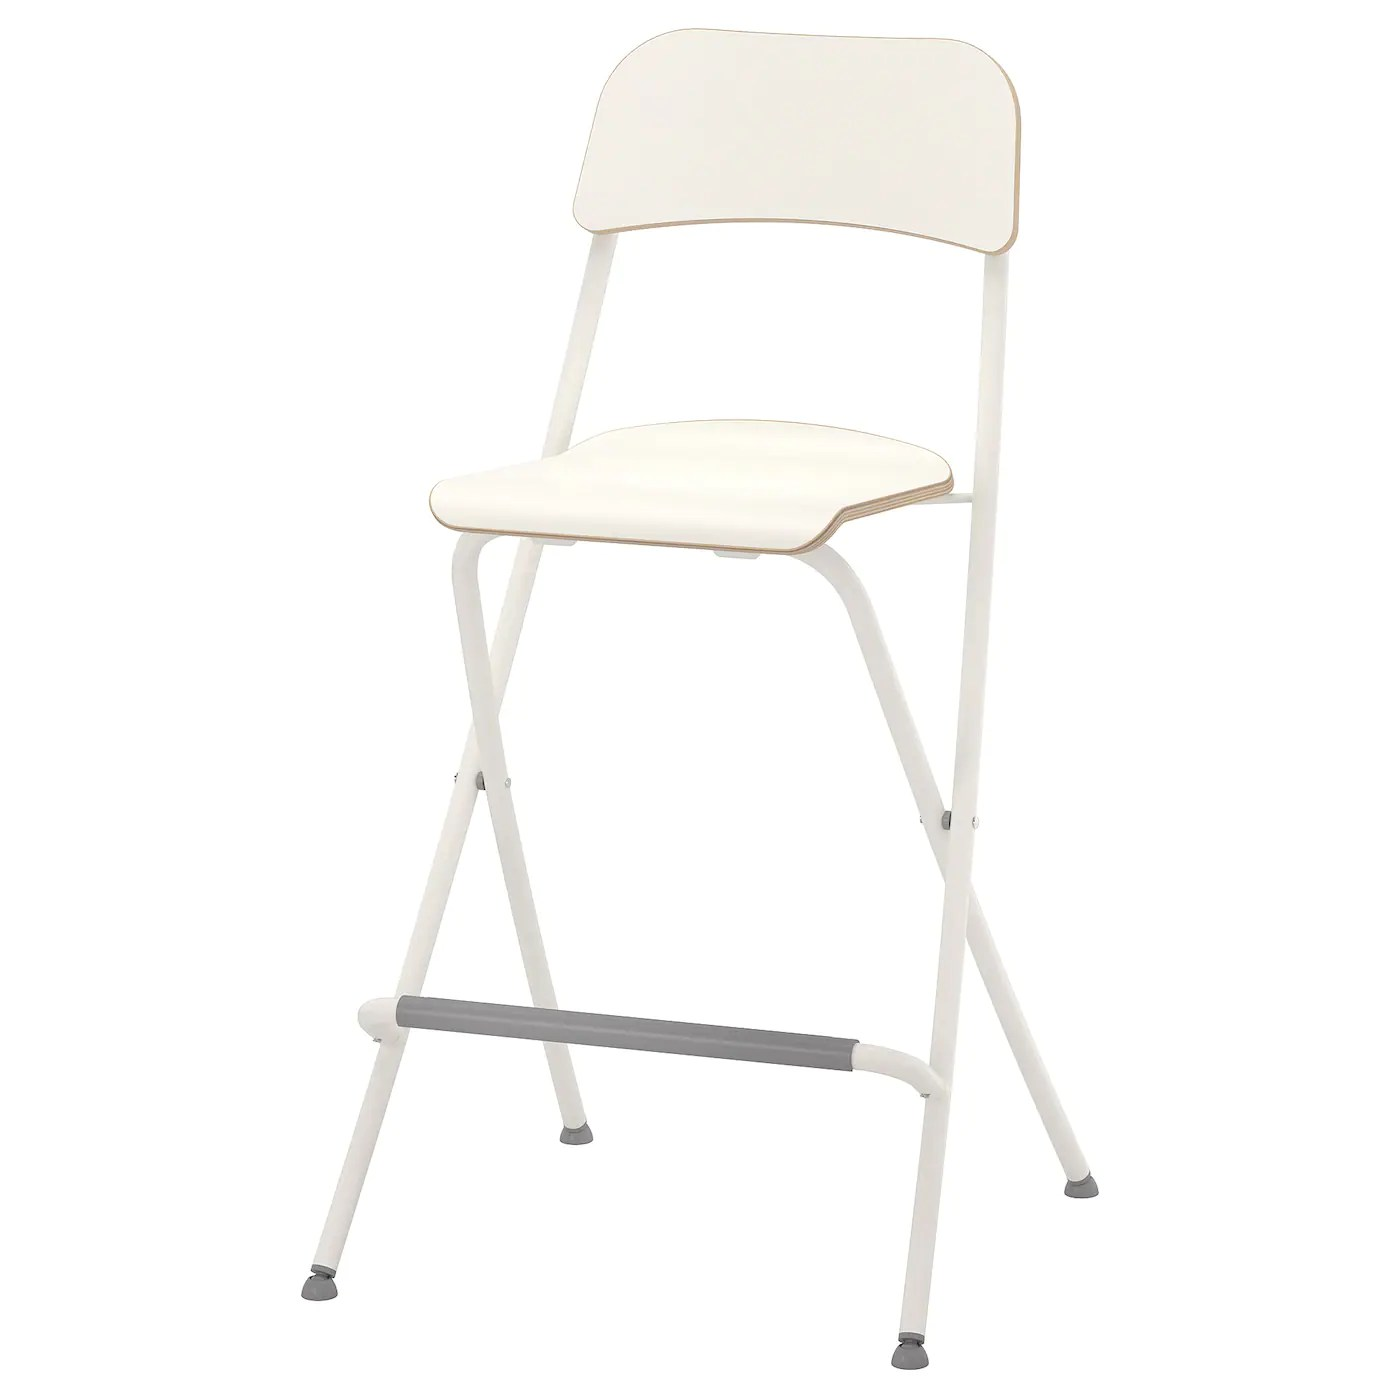 franklin chaise de bar pliante blanc blanc 63 cm